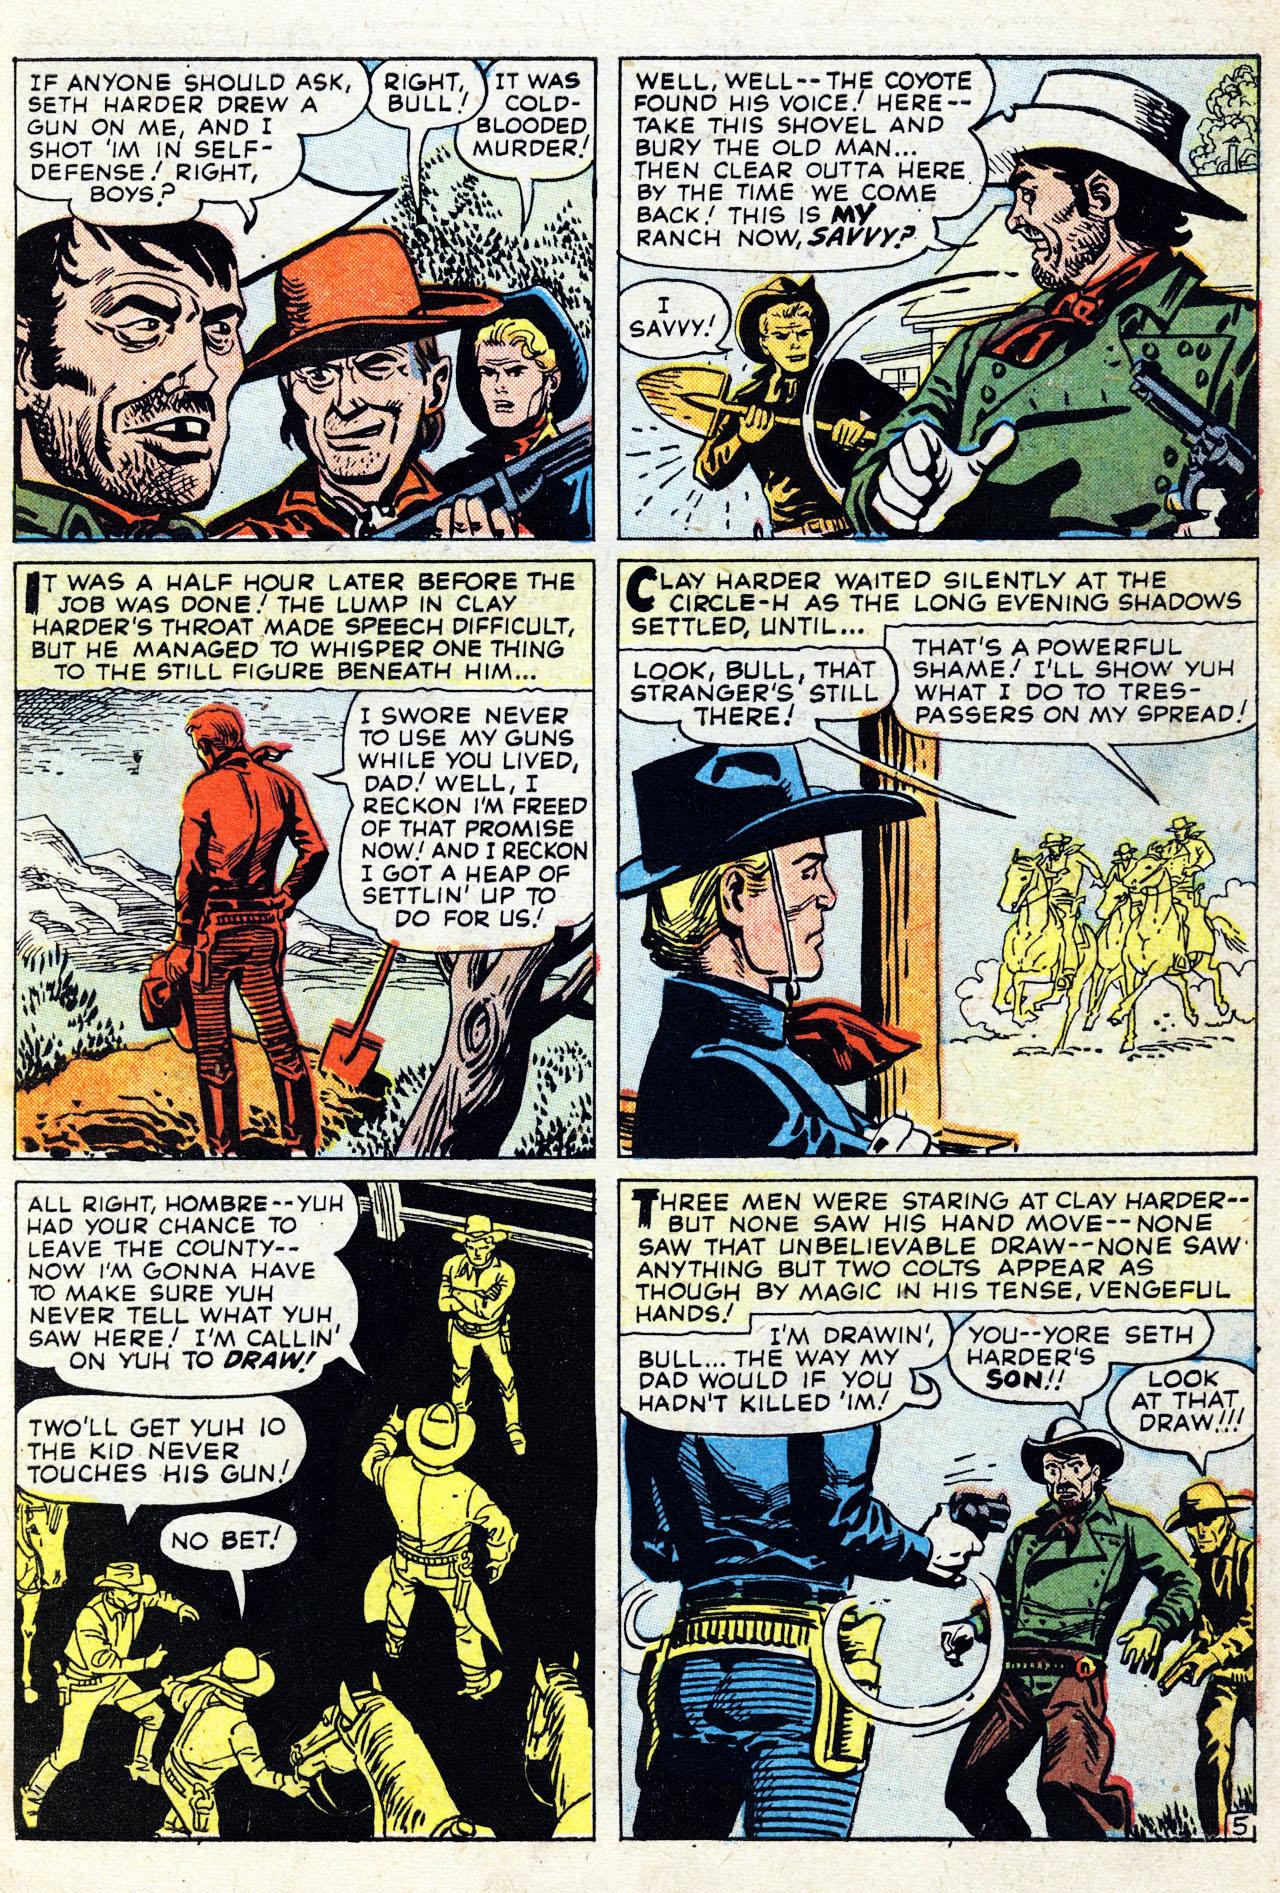 Read online Two-Gun Kid comic -  Issue #41 - 7